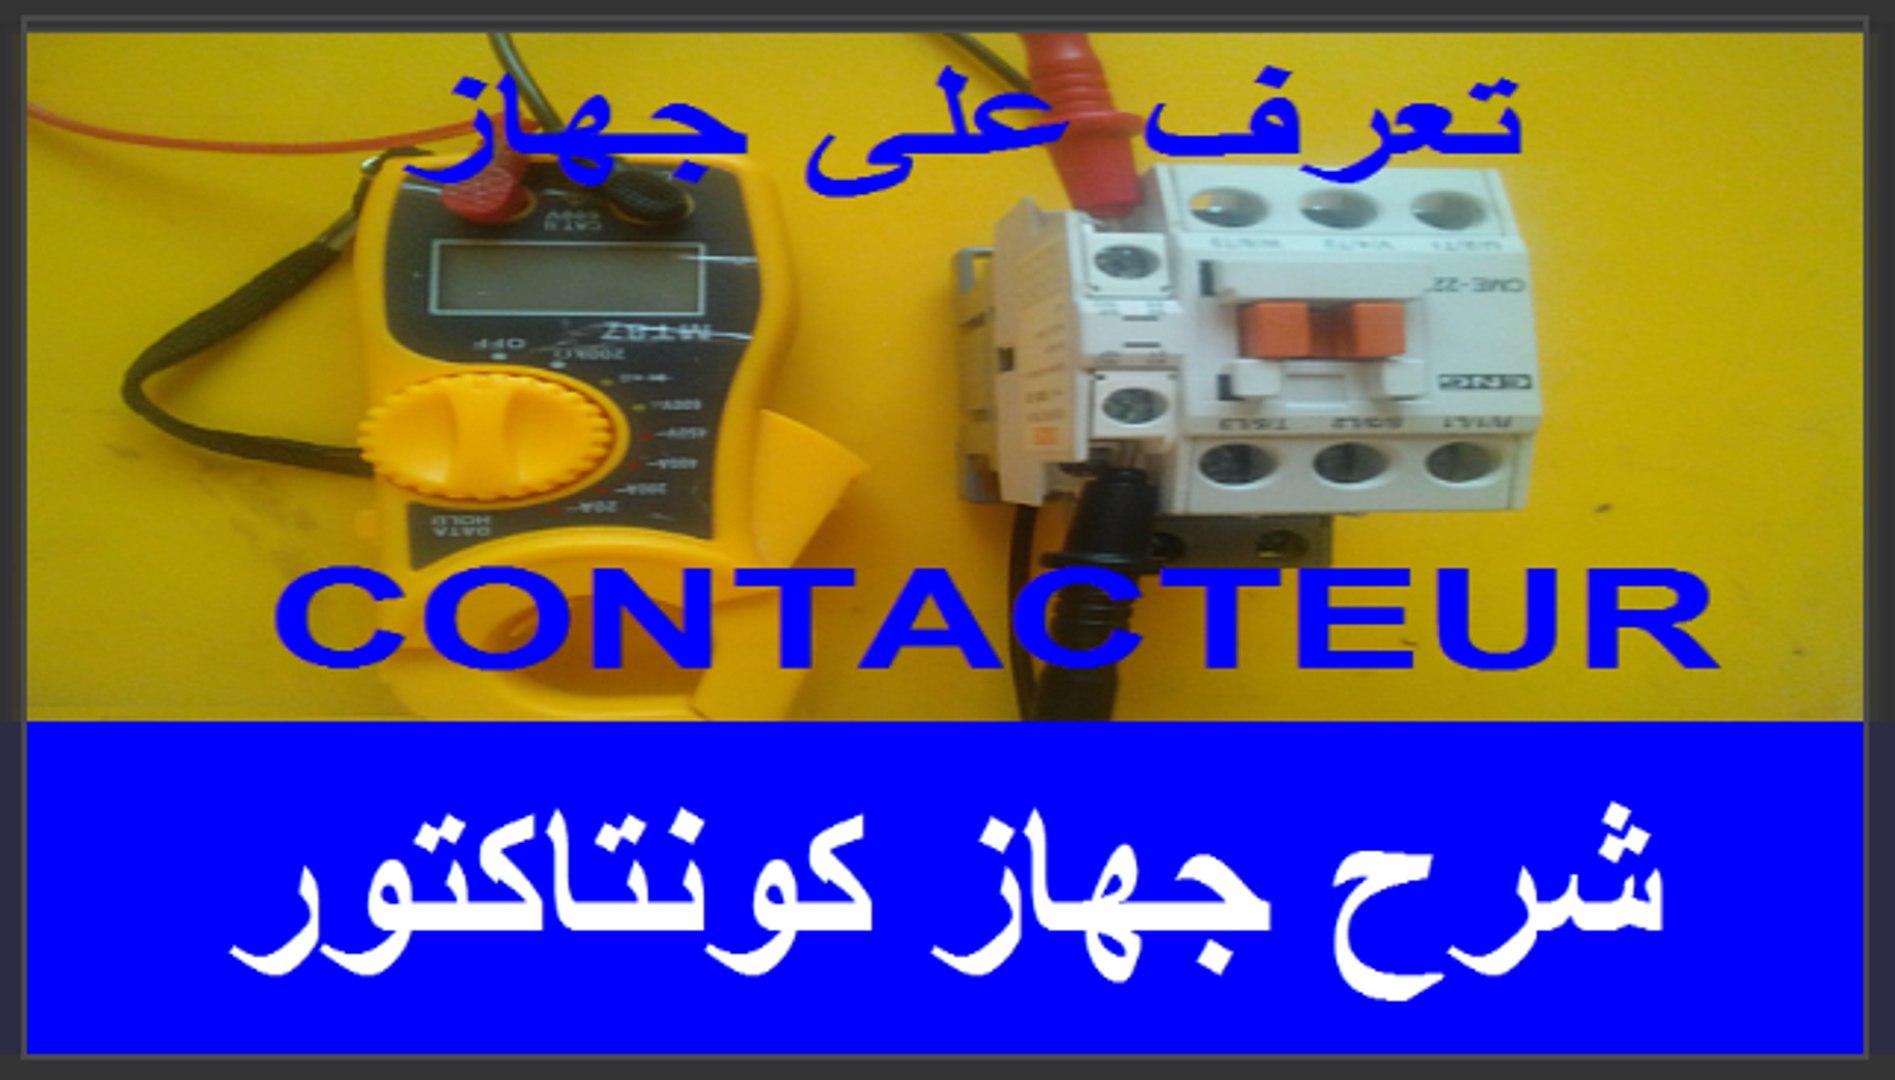 شرح جهاز كونتاكتورcontacteur